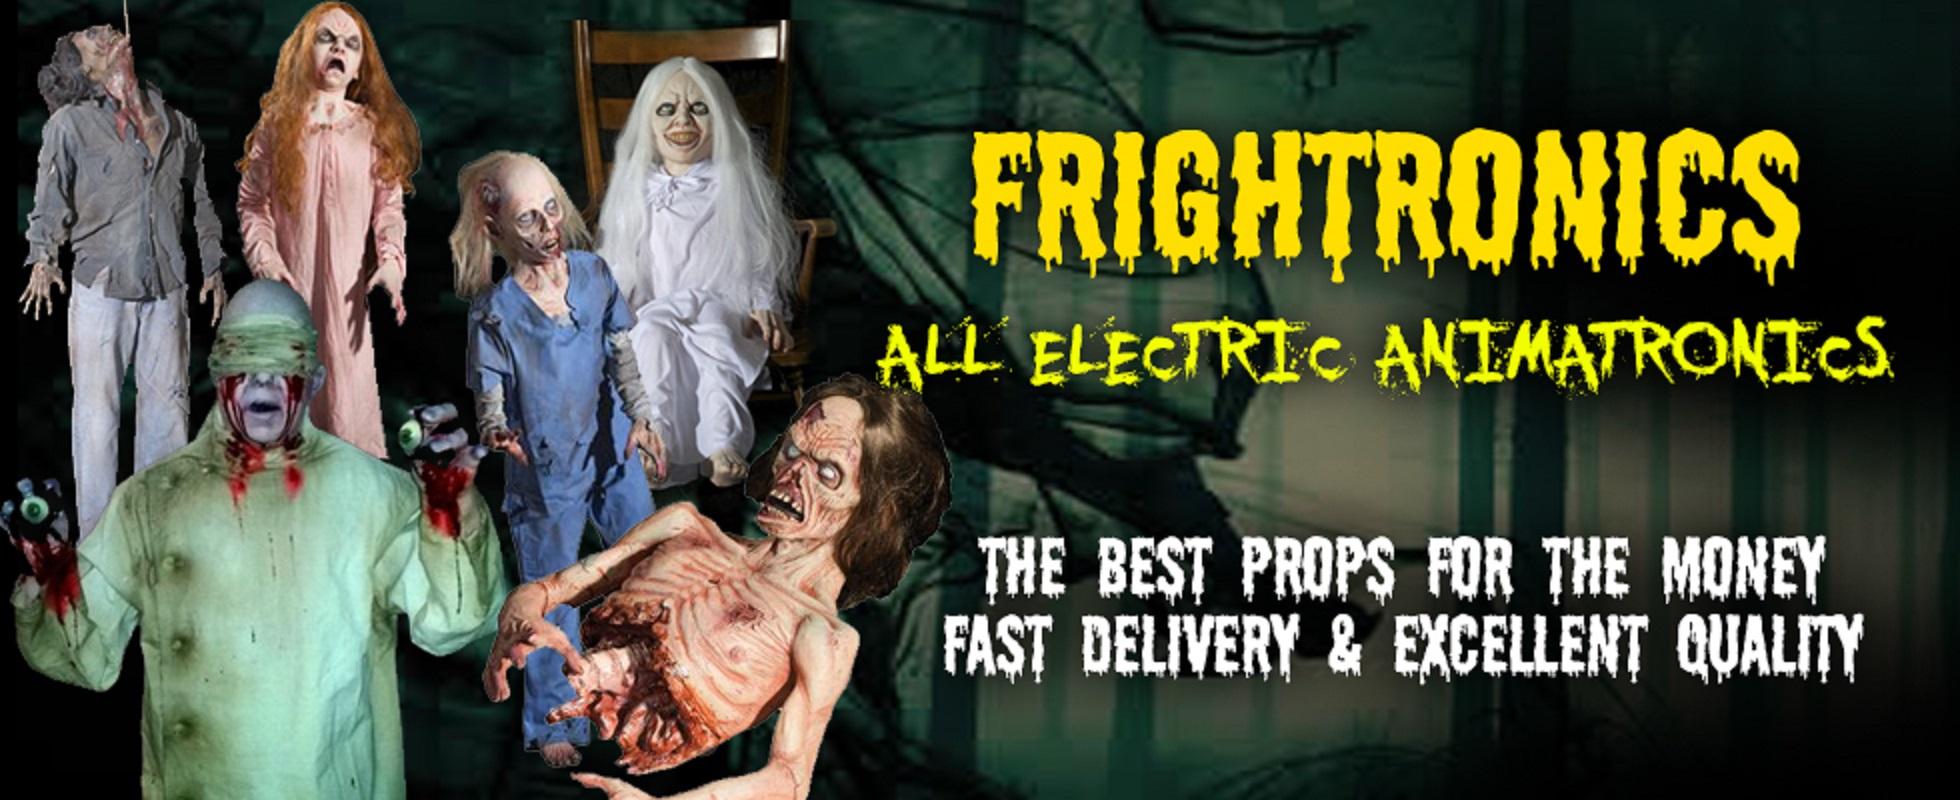 frighttronics